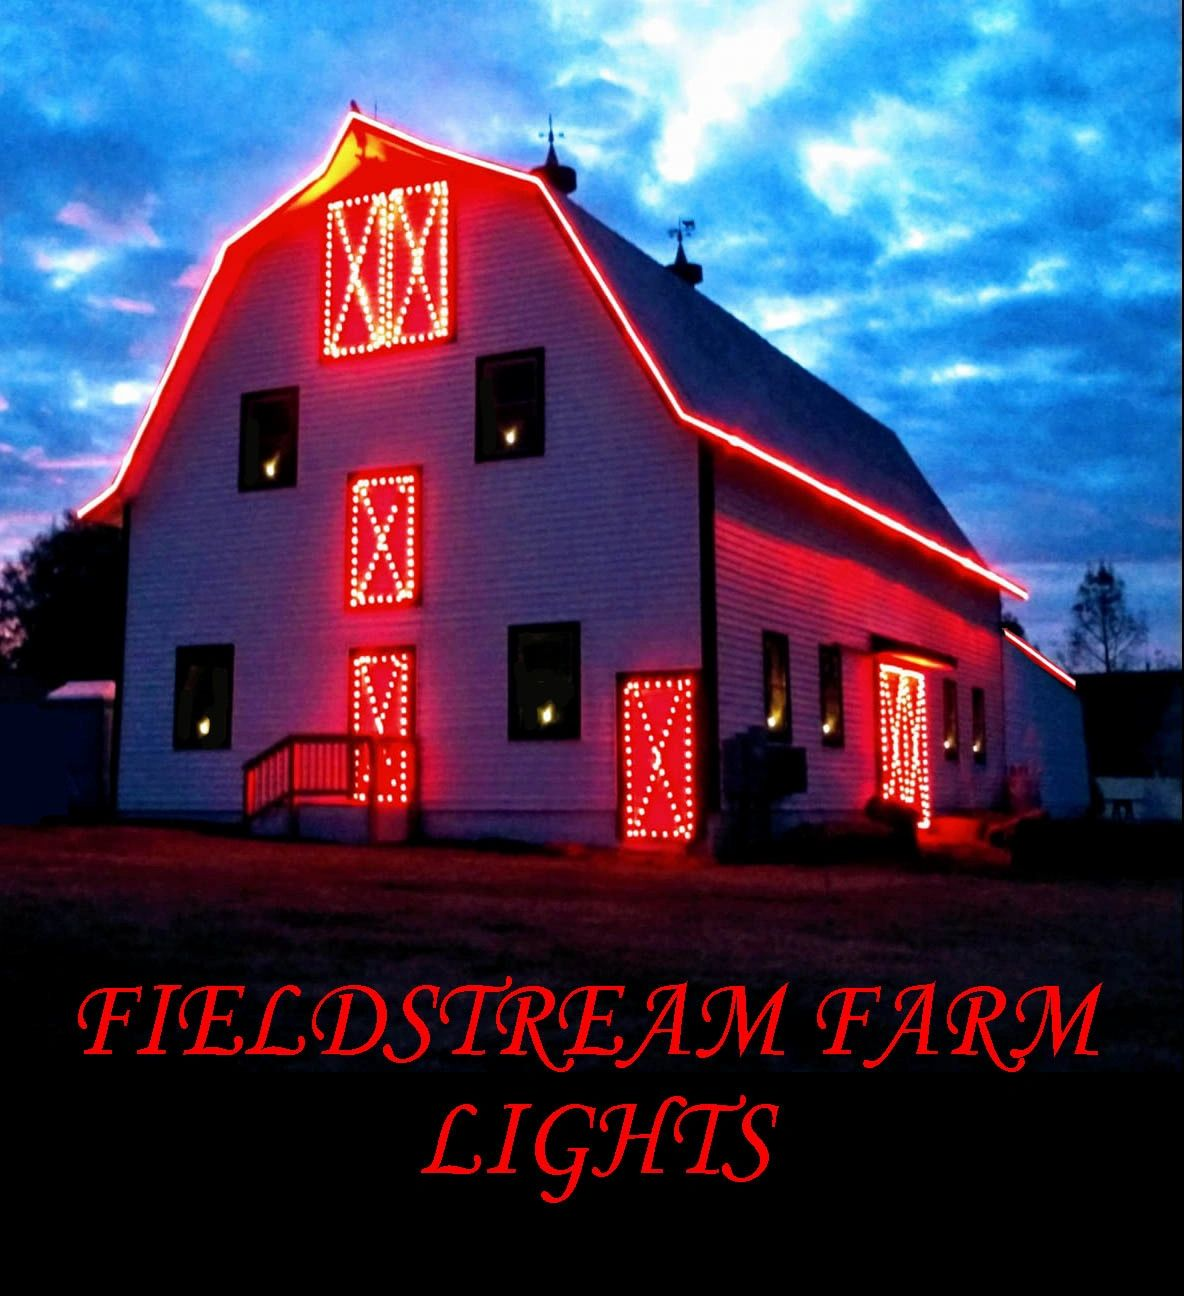 Christmas Lights Raleigh Nc 2020 That You Can Drive Through Fieldstream Farm   Christmas Light Show   Raleigh, North Carolina